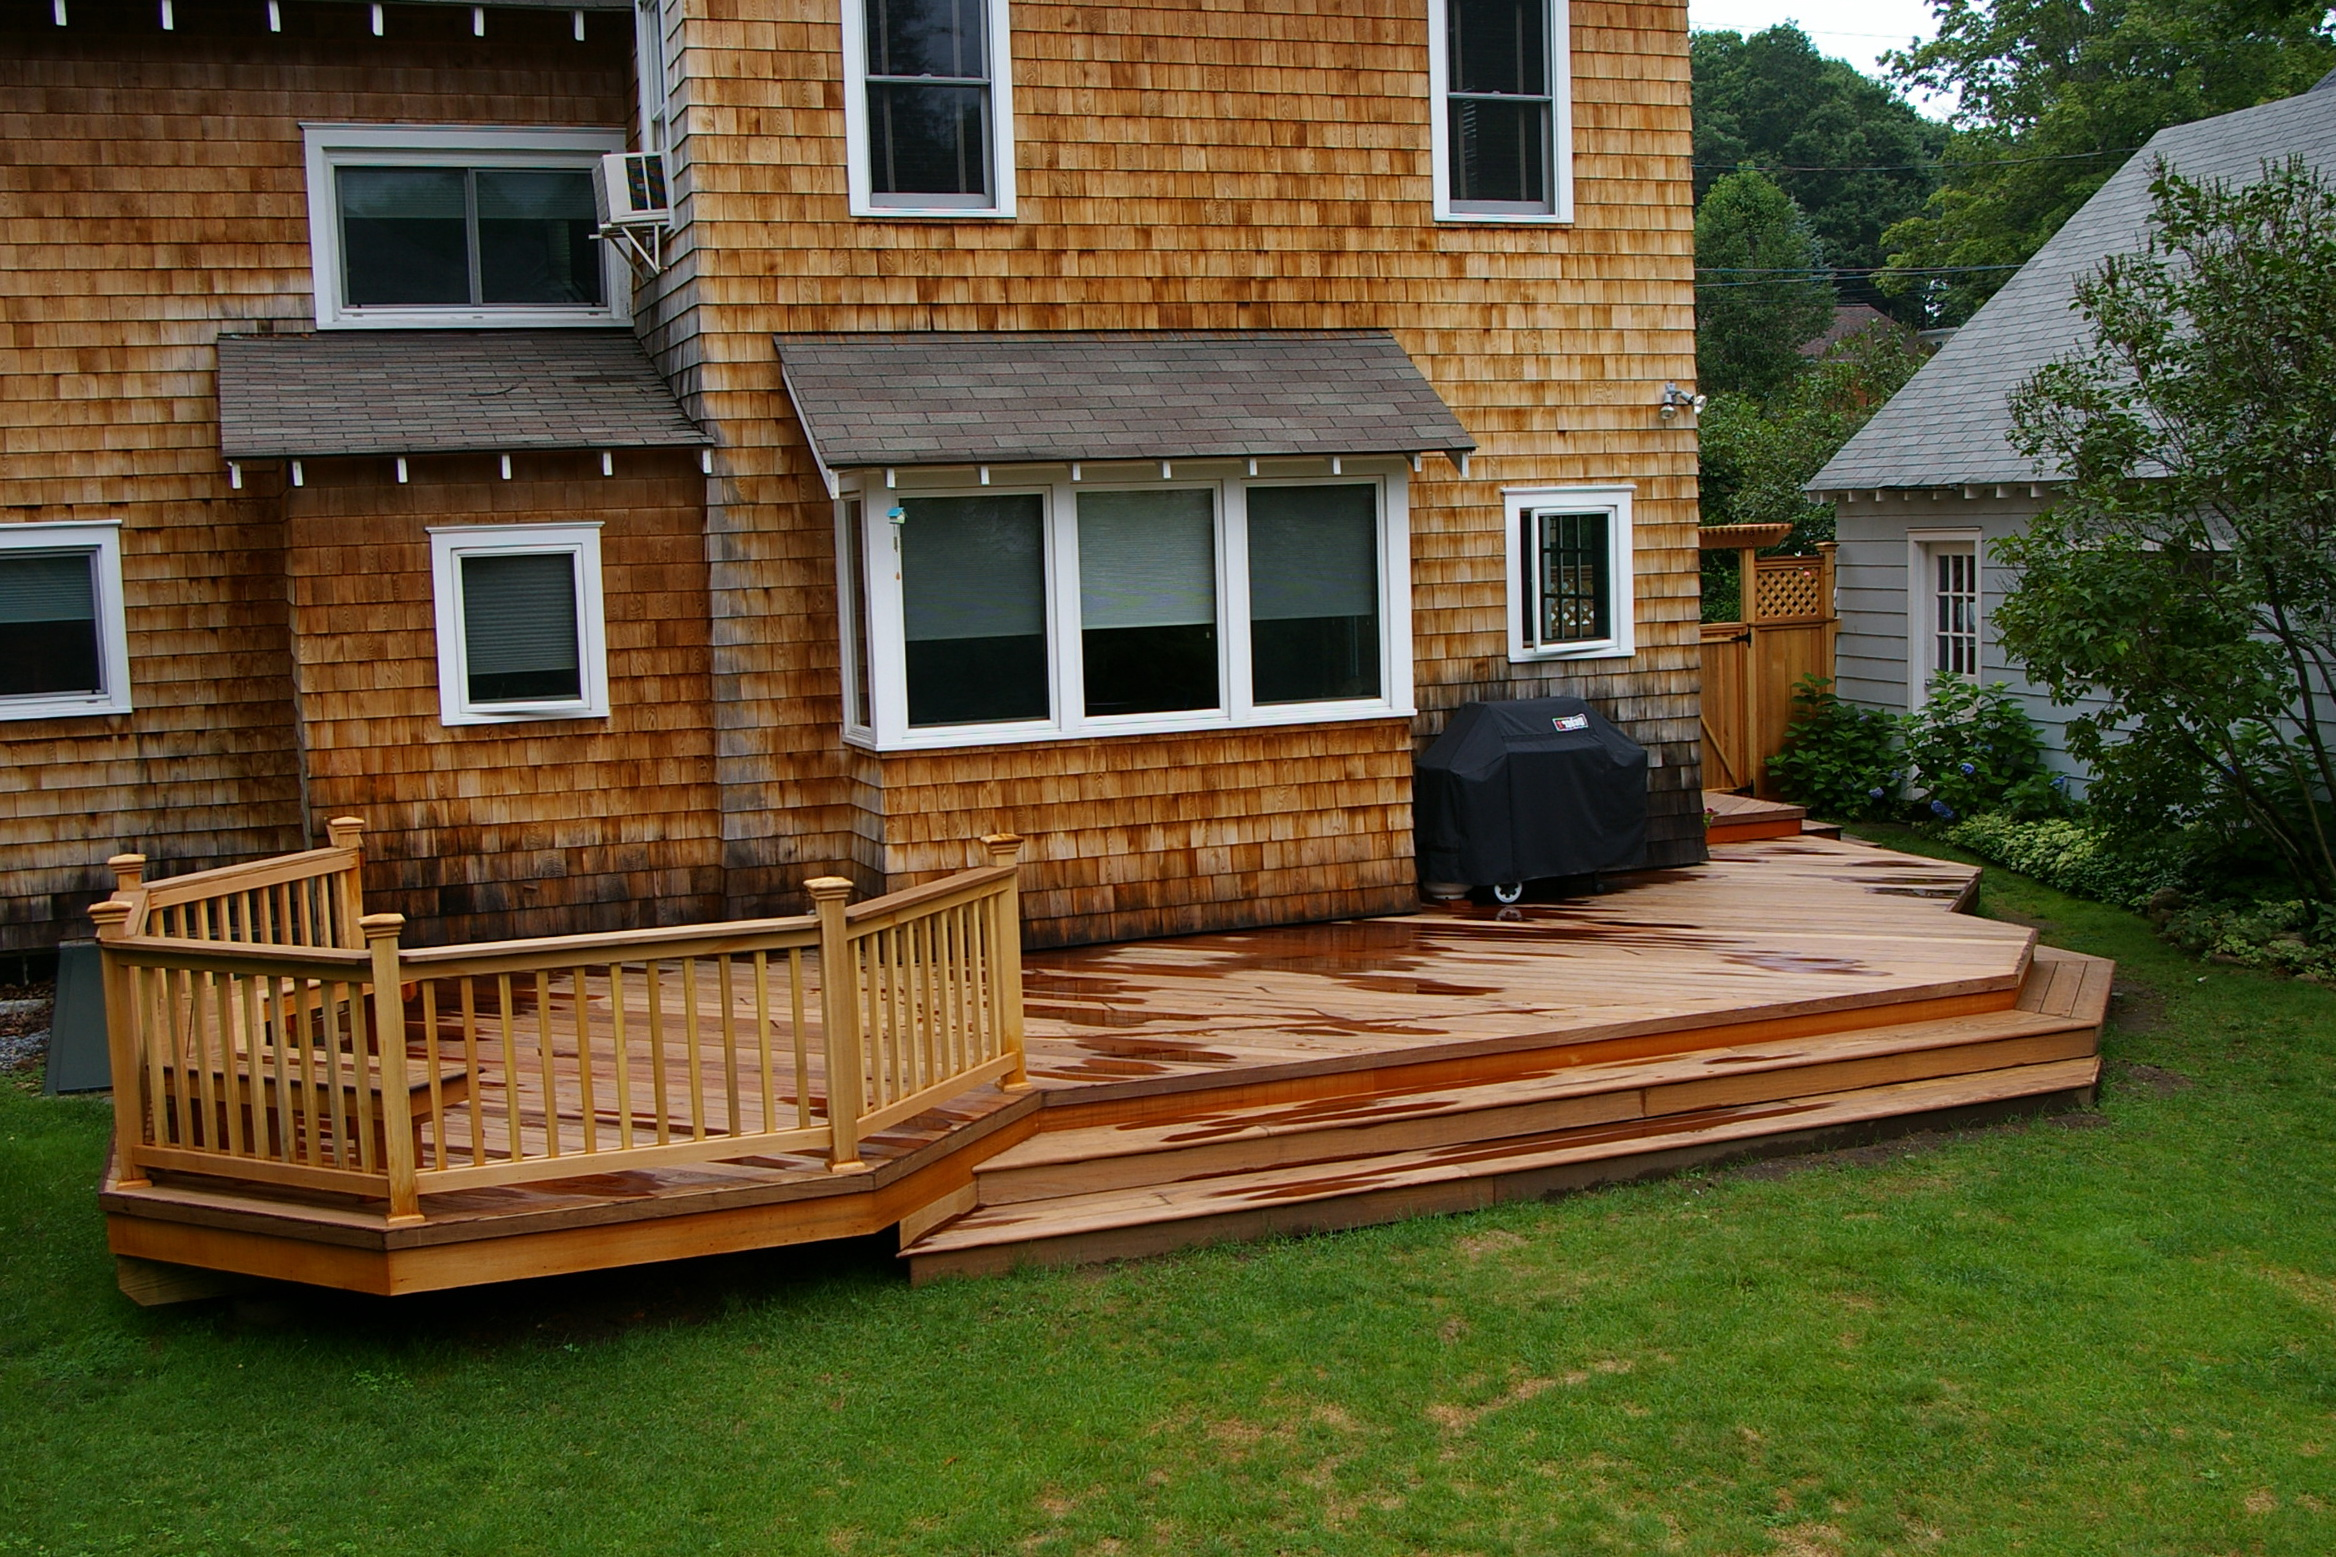 Lowes deck designer home design ideas - Home depot deck design software canada ...